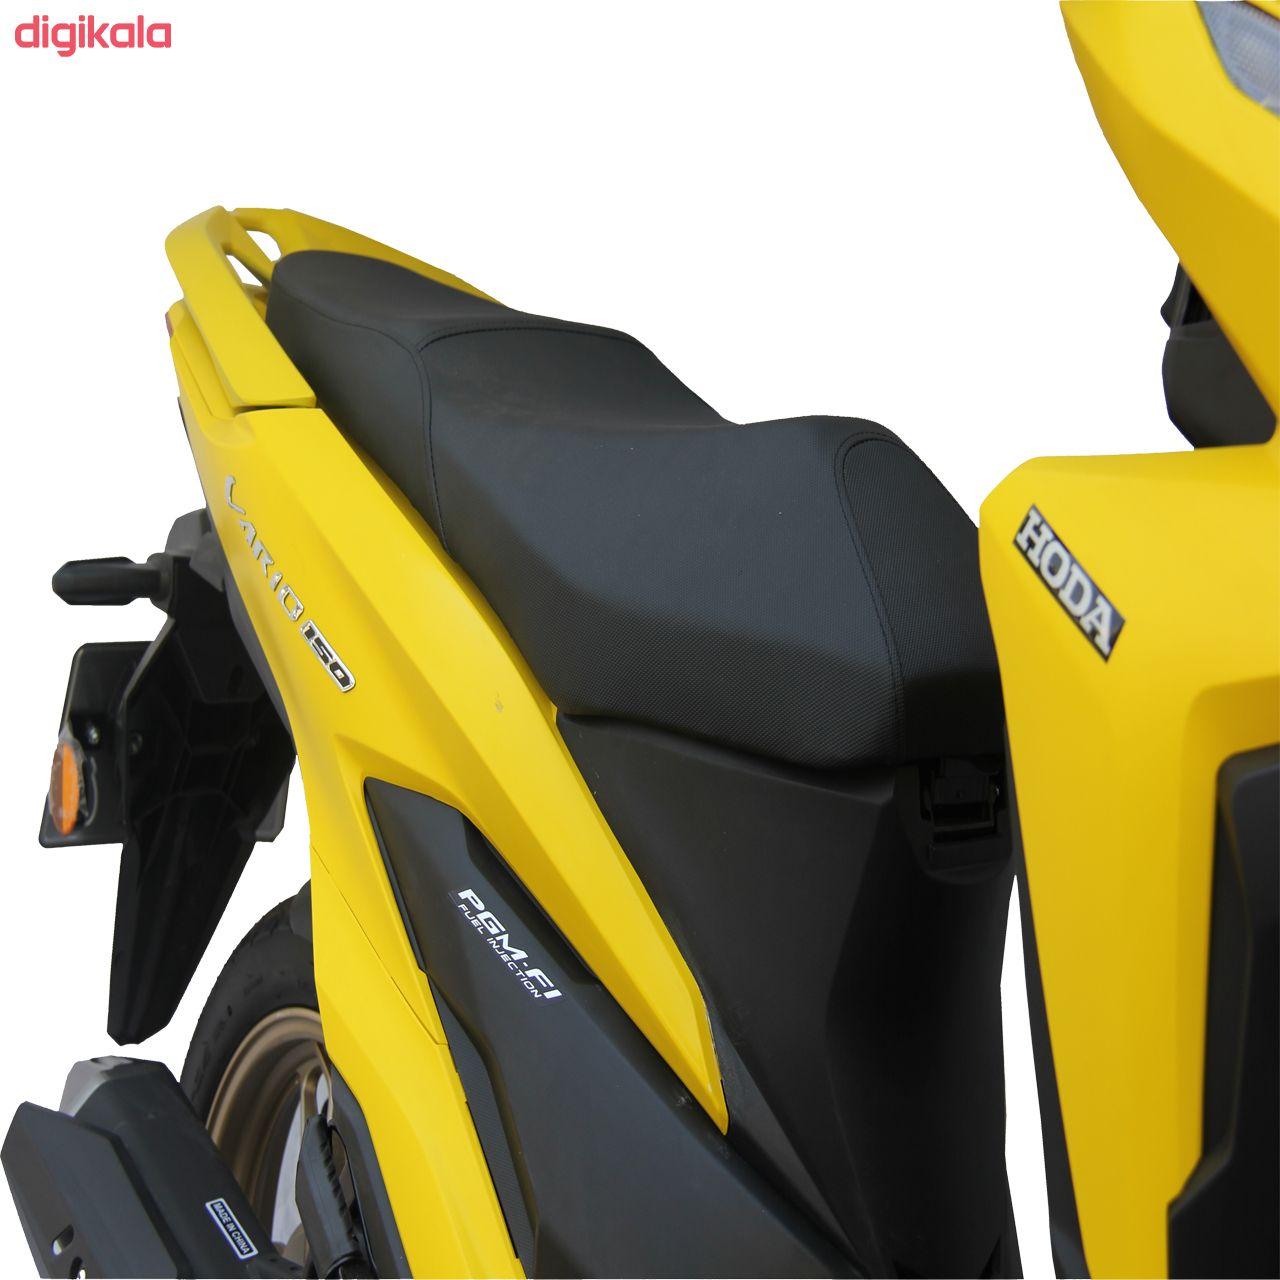 موتورسیکلت کلیک مدل هدا 150 سی سی سال 1399 main 1 1